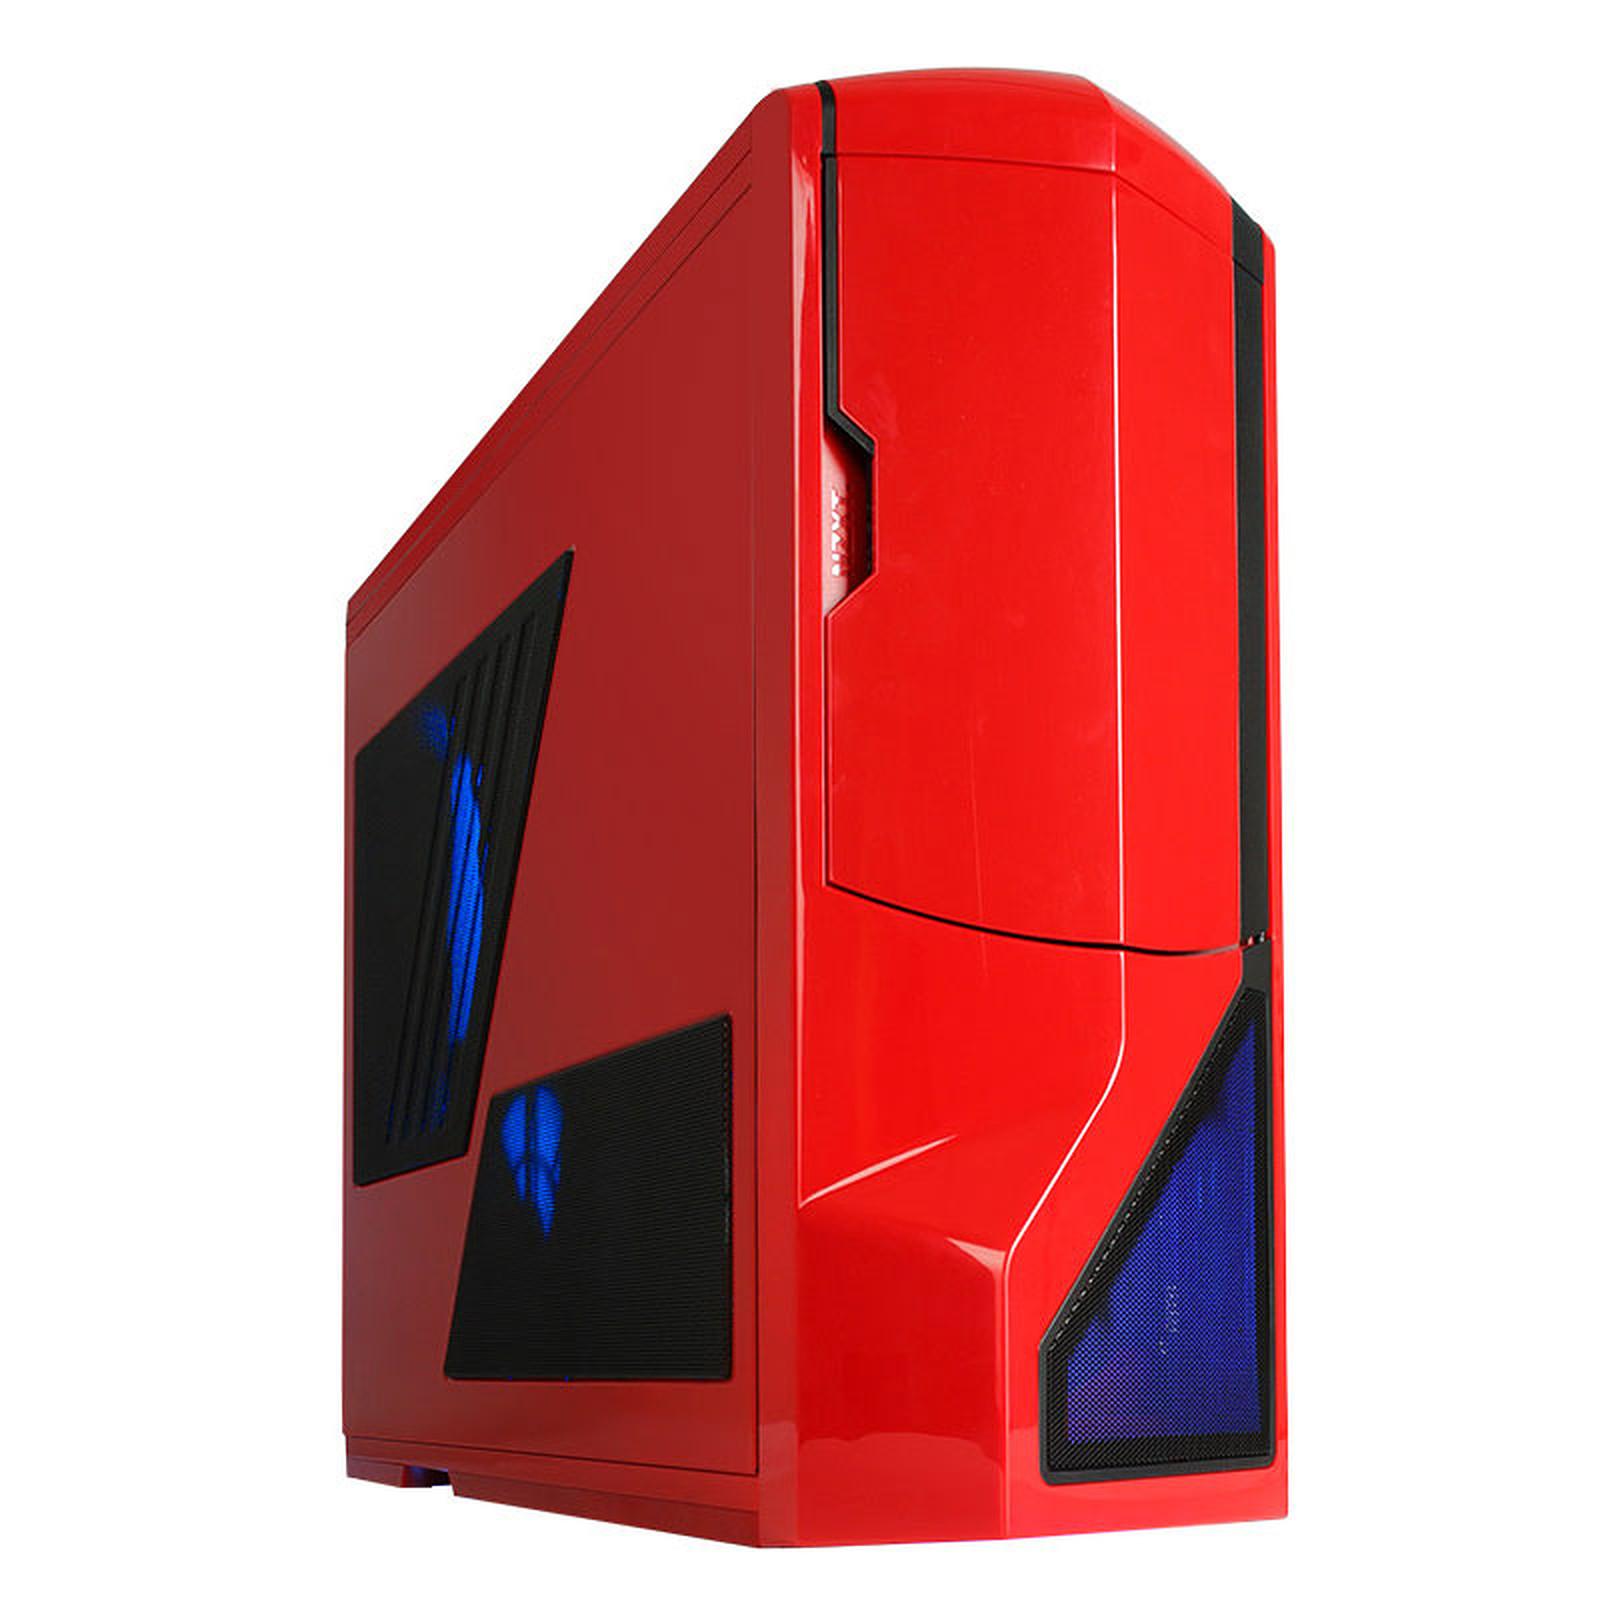 NZXT Phantom (rouge) - Edition USB 3.0